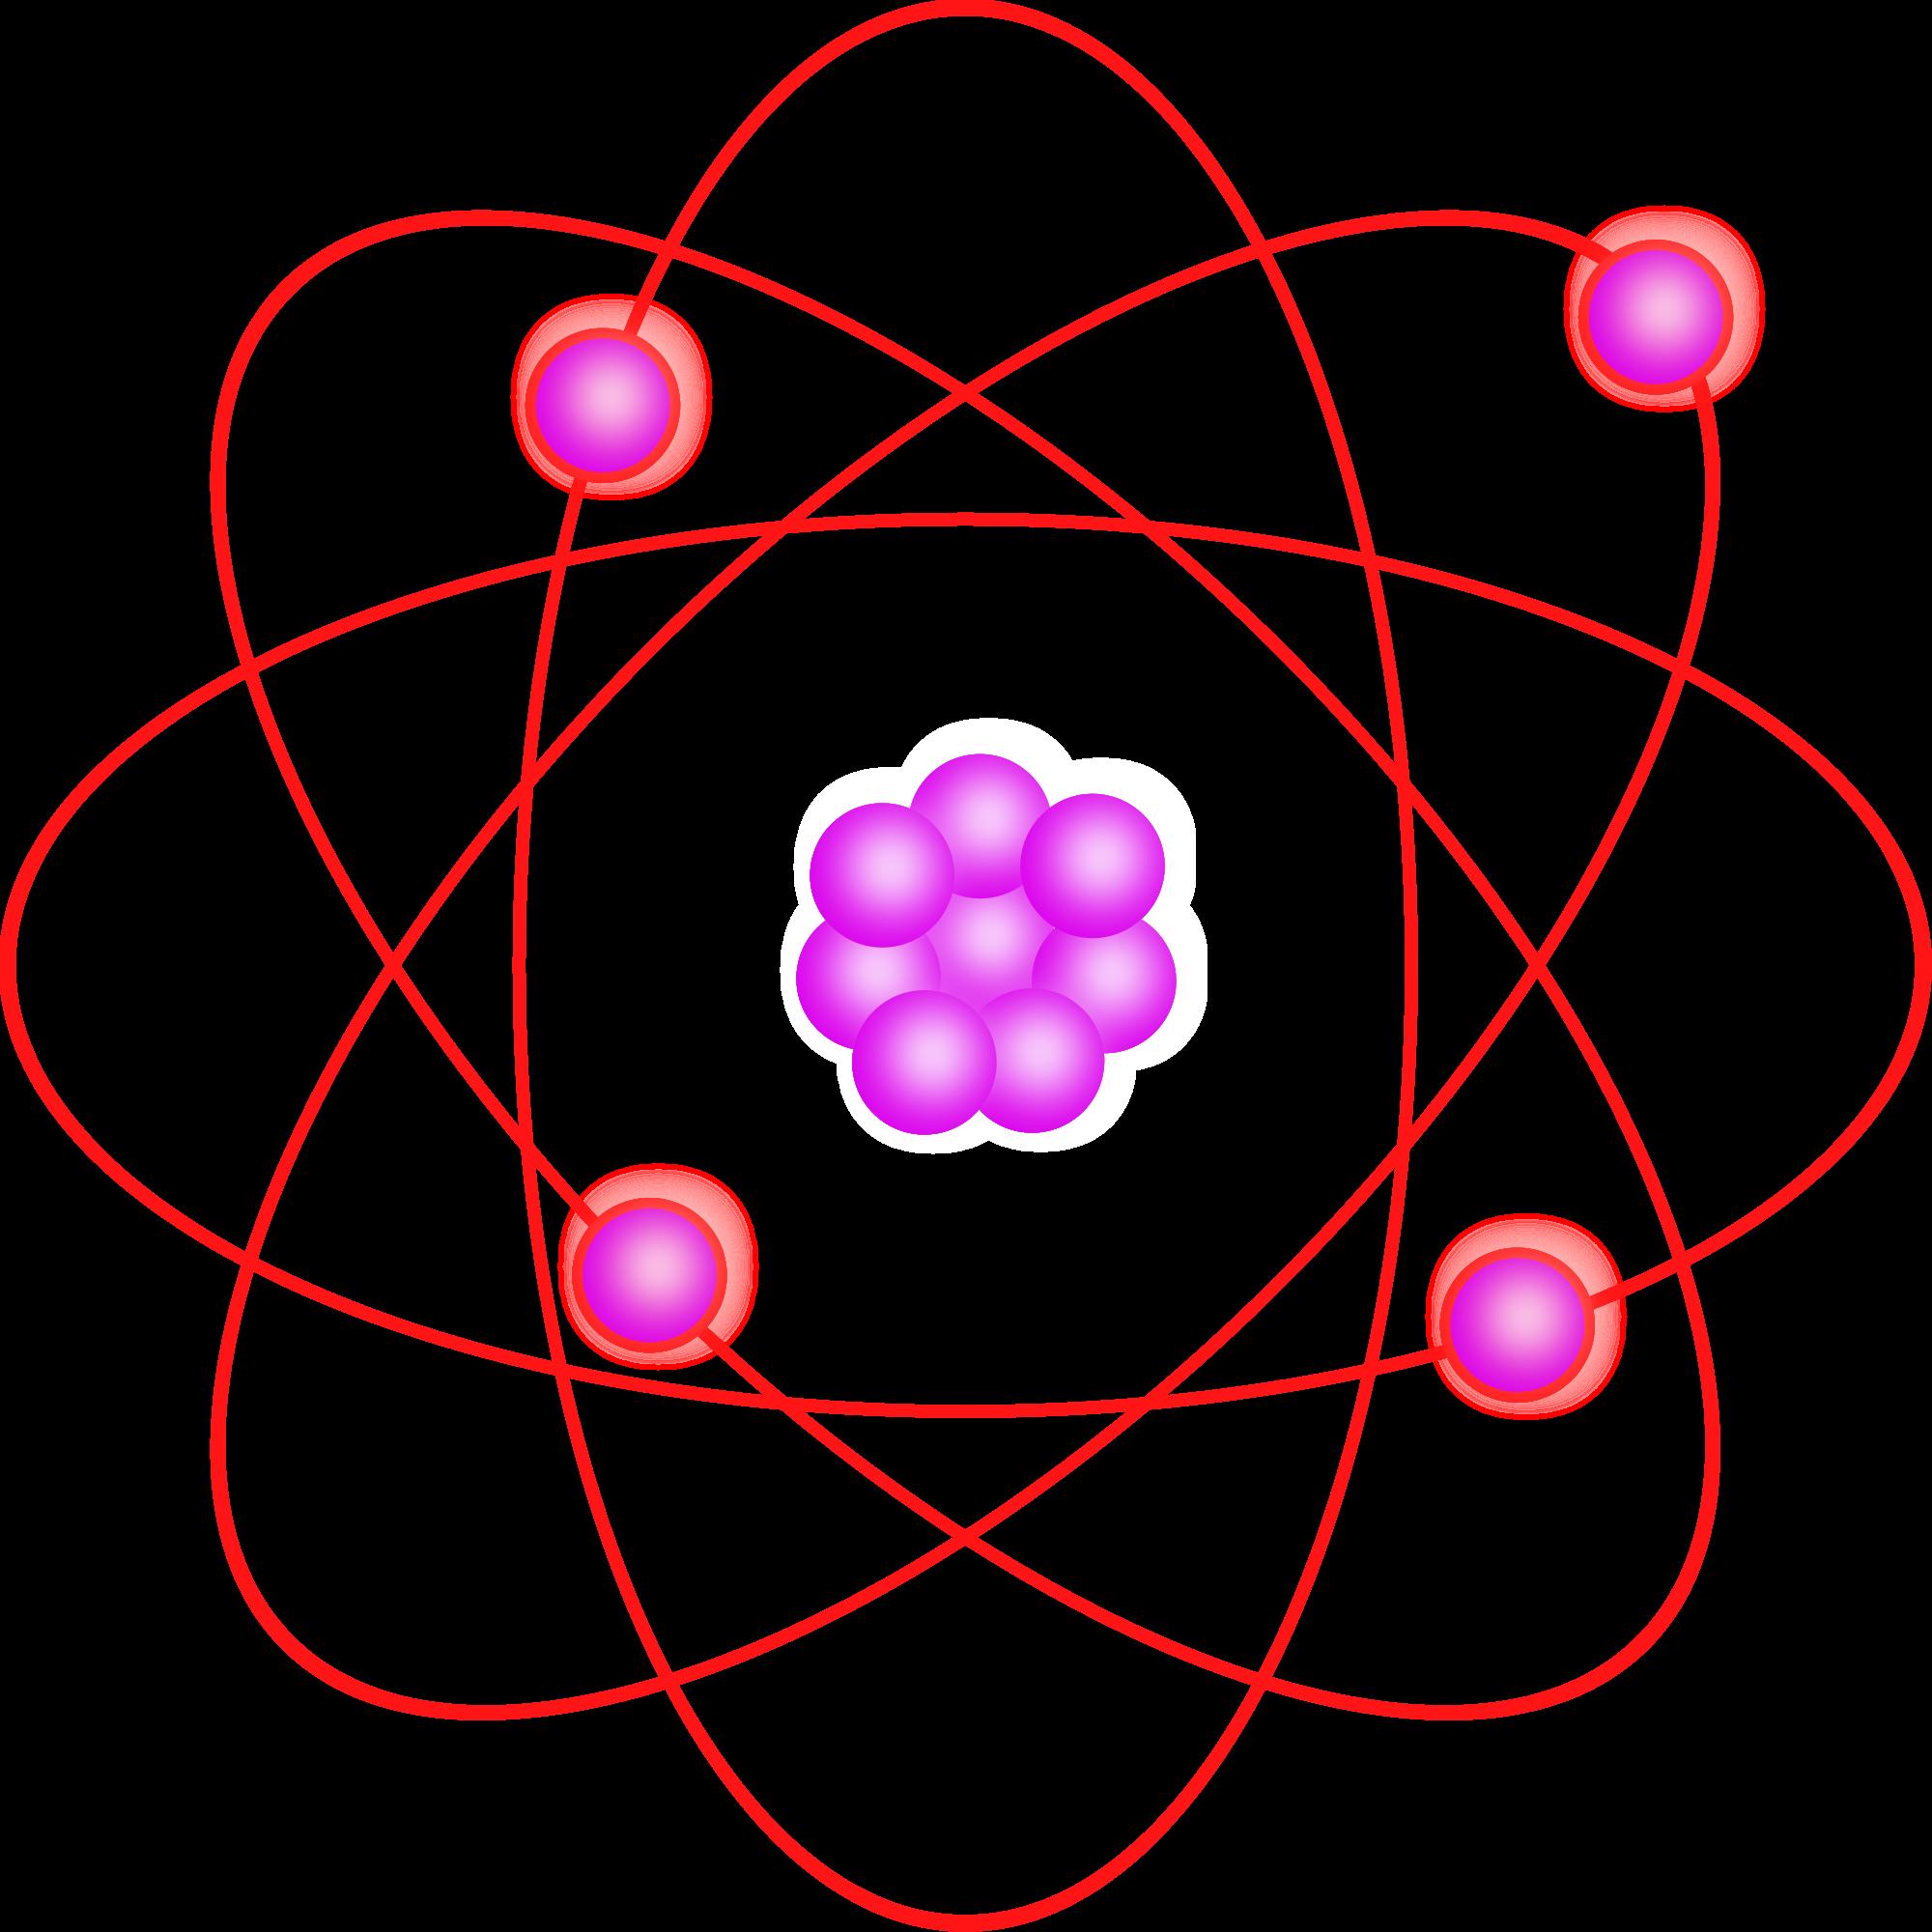 Structure clipart atoms and molecule Free Clip Clipart Clipart Art